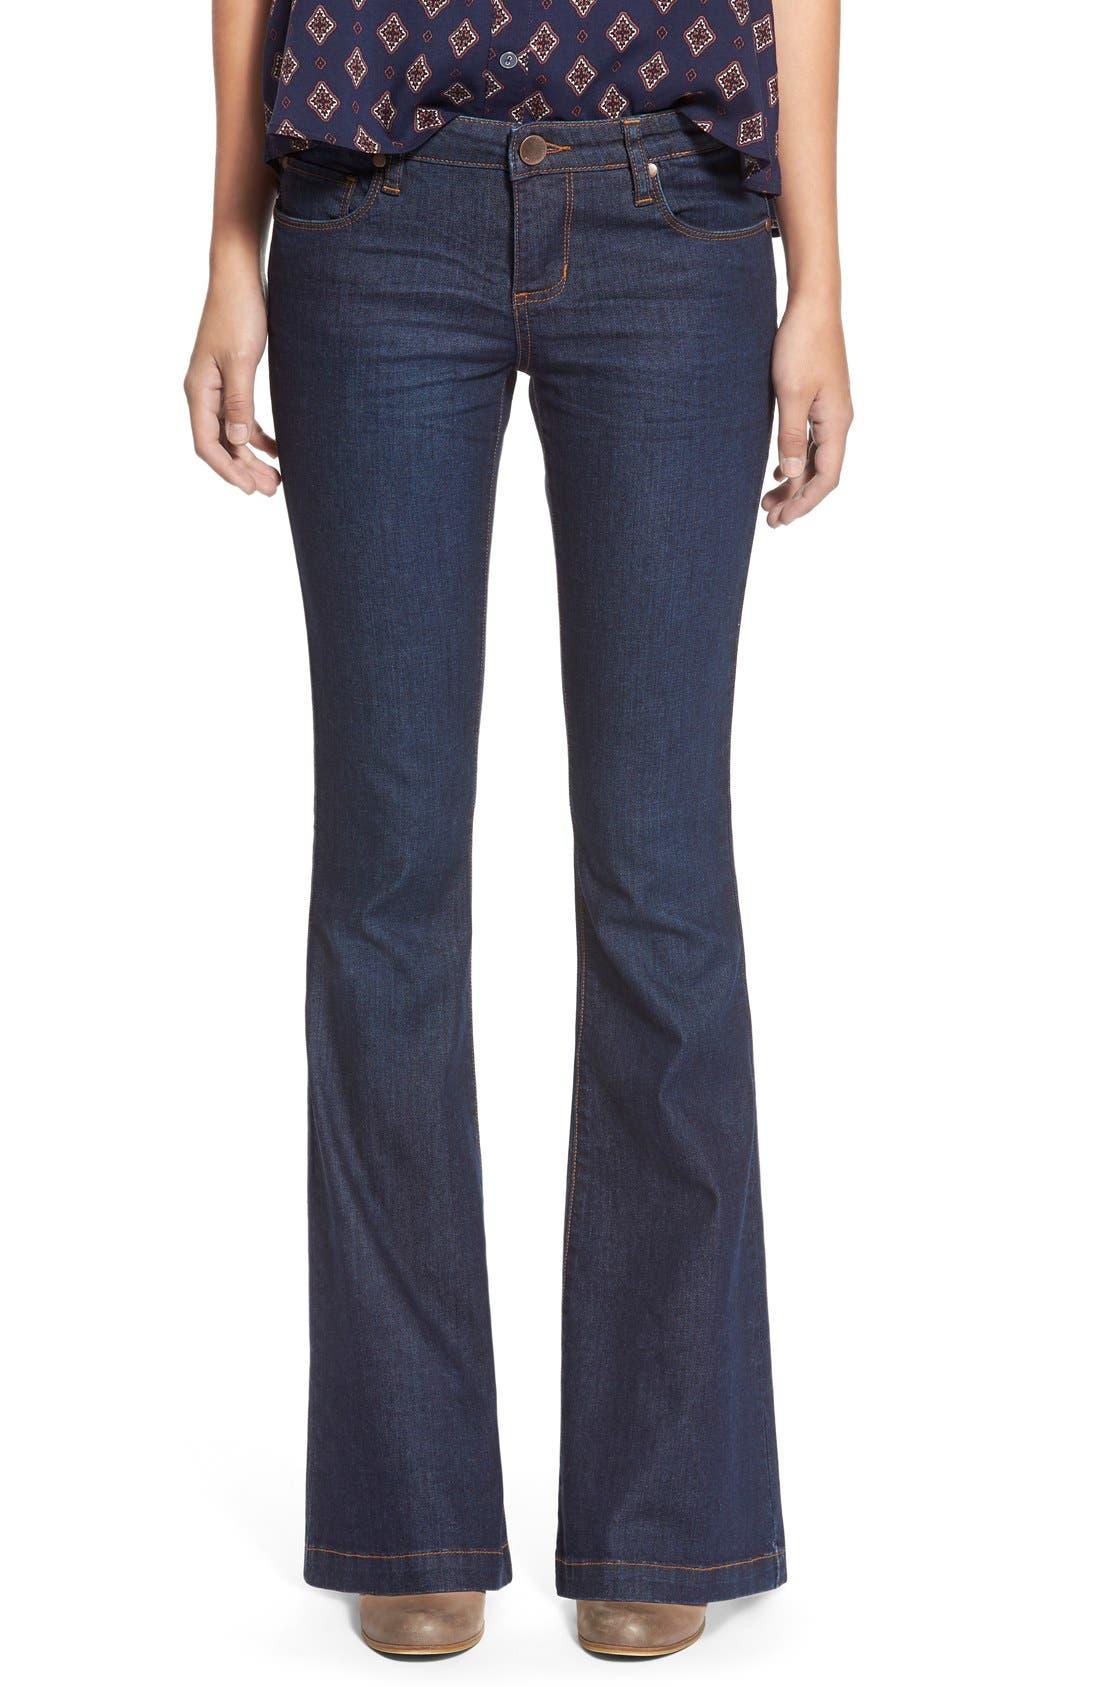 Alternate Image 1 Selected - STSBlue 'Nikki' Flare Leg Skinny Jeans (Napa)